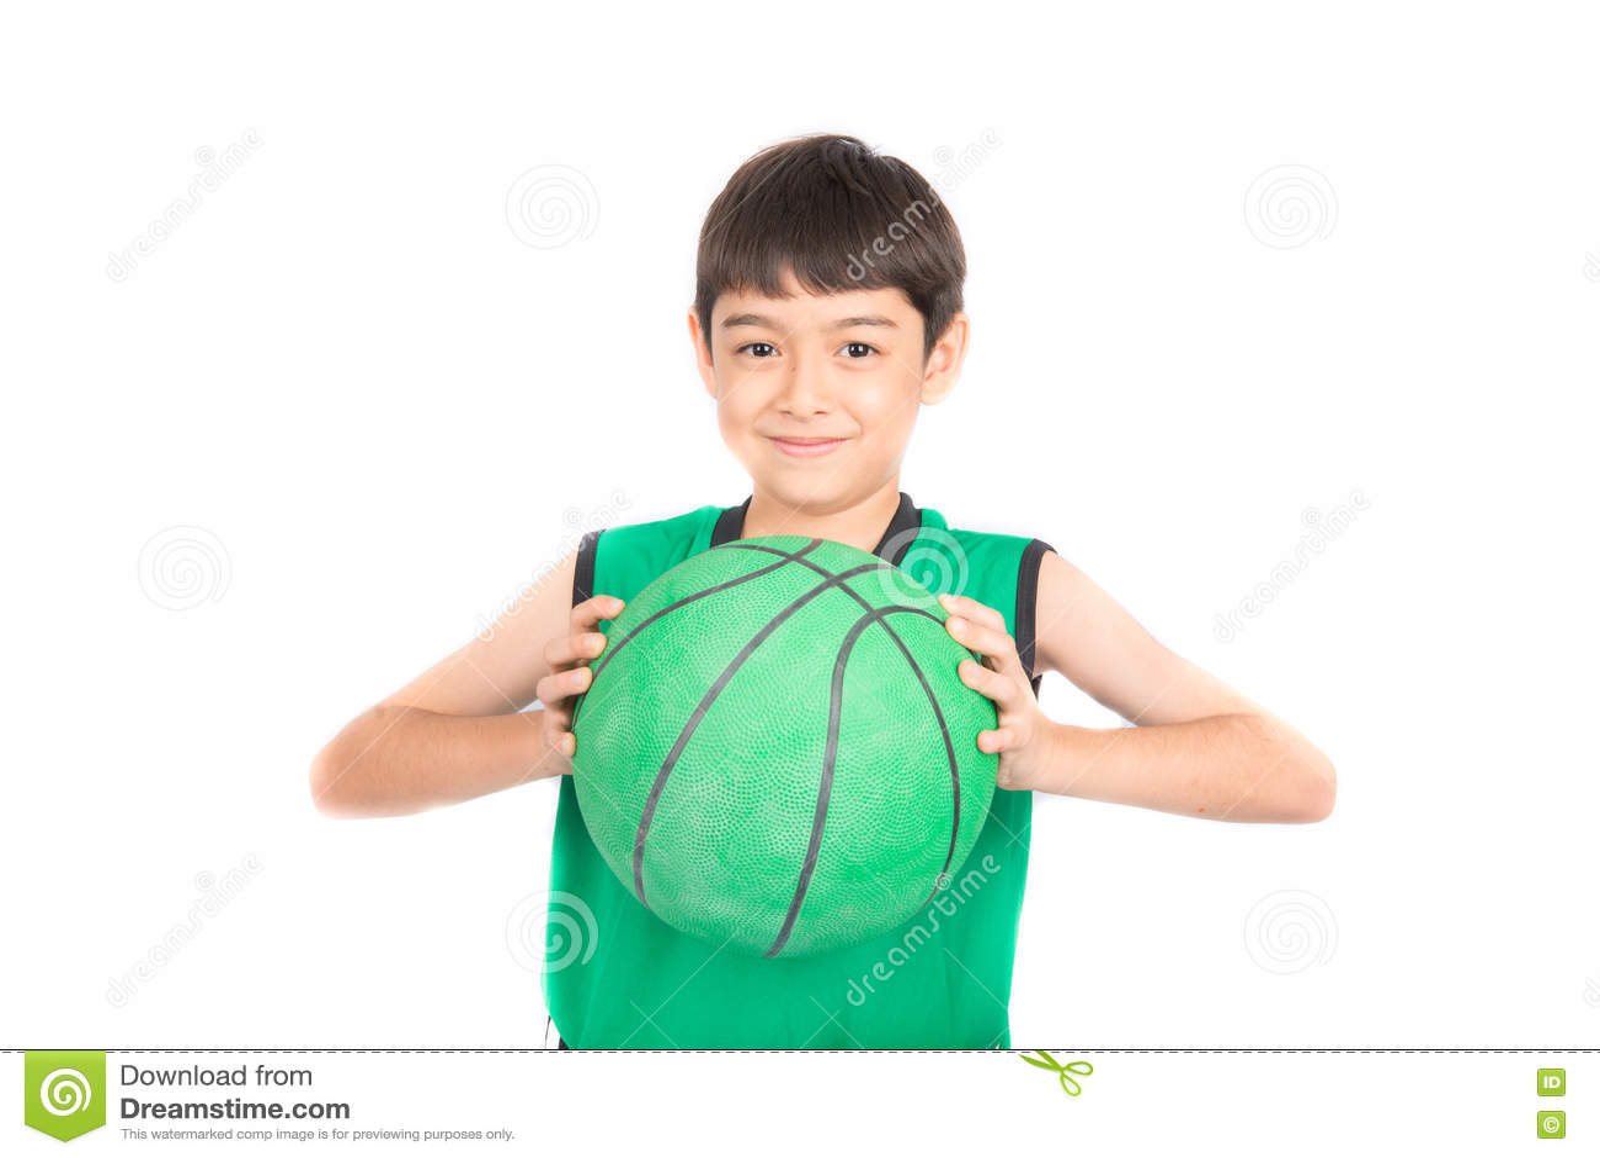 Little boy playing green basketball in green PE uniform sport